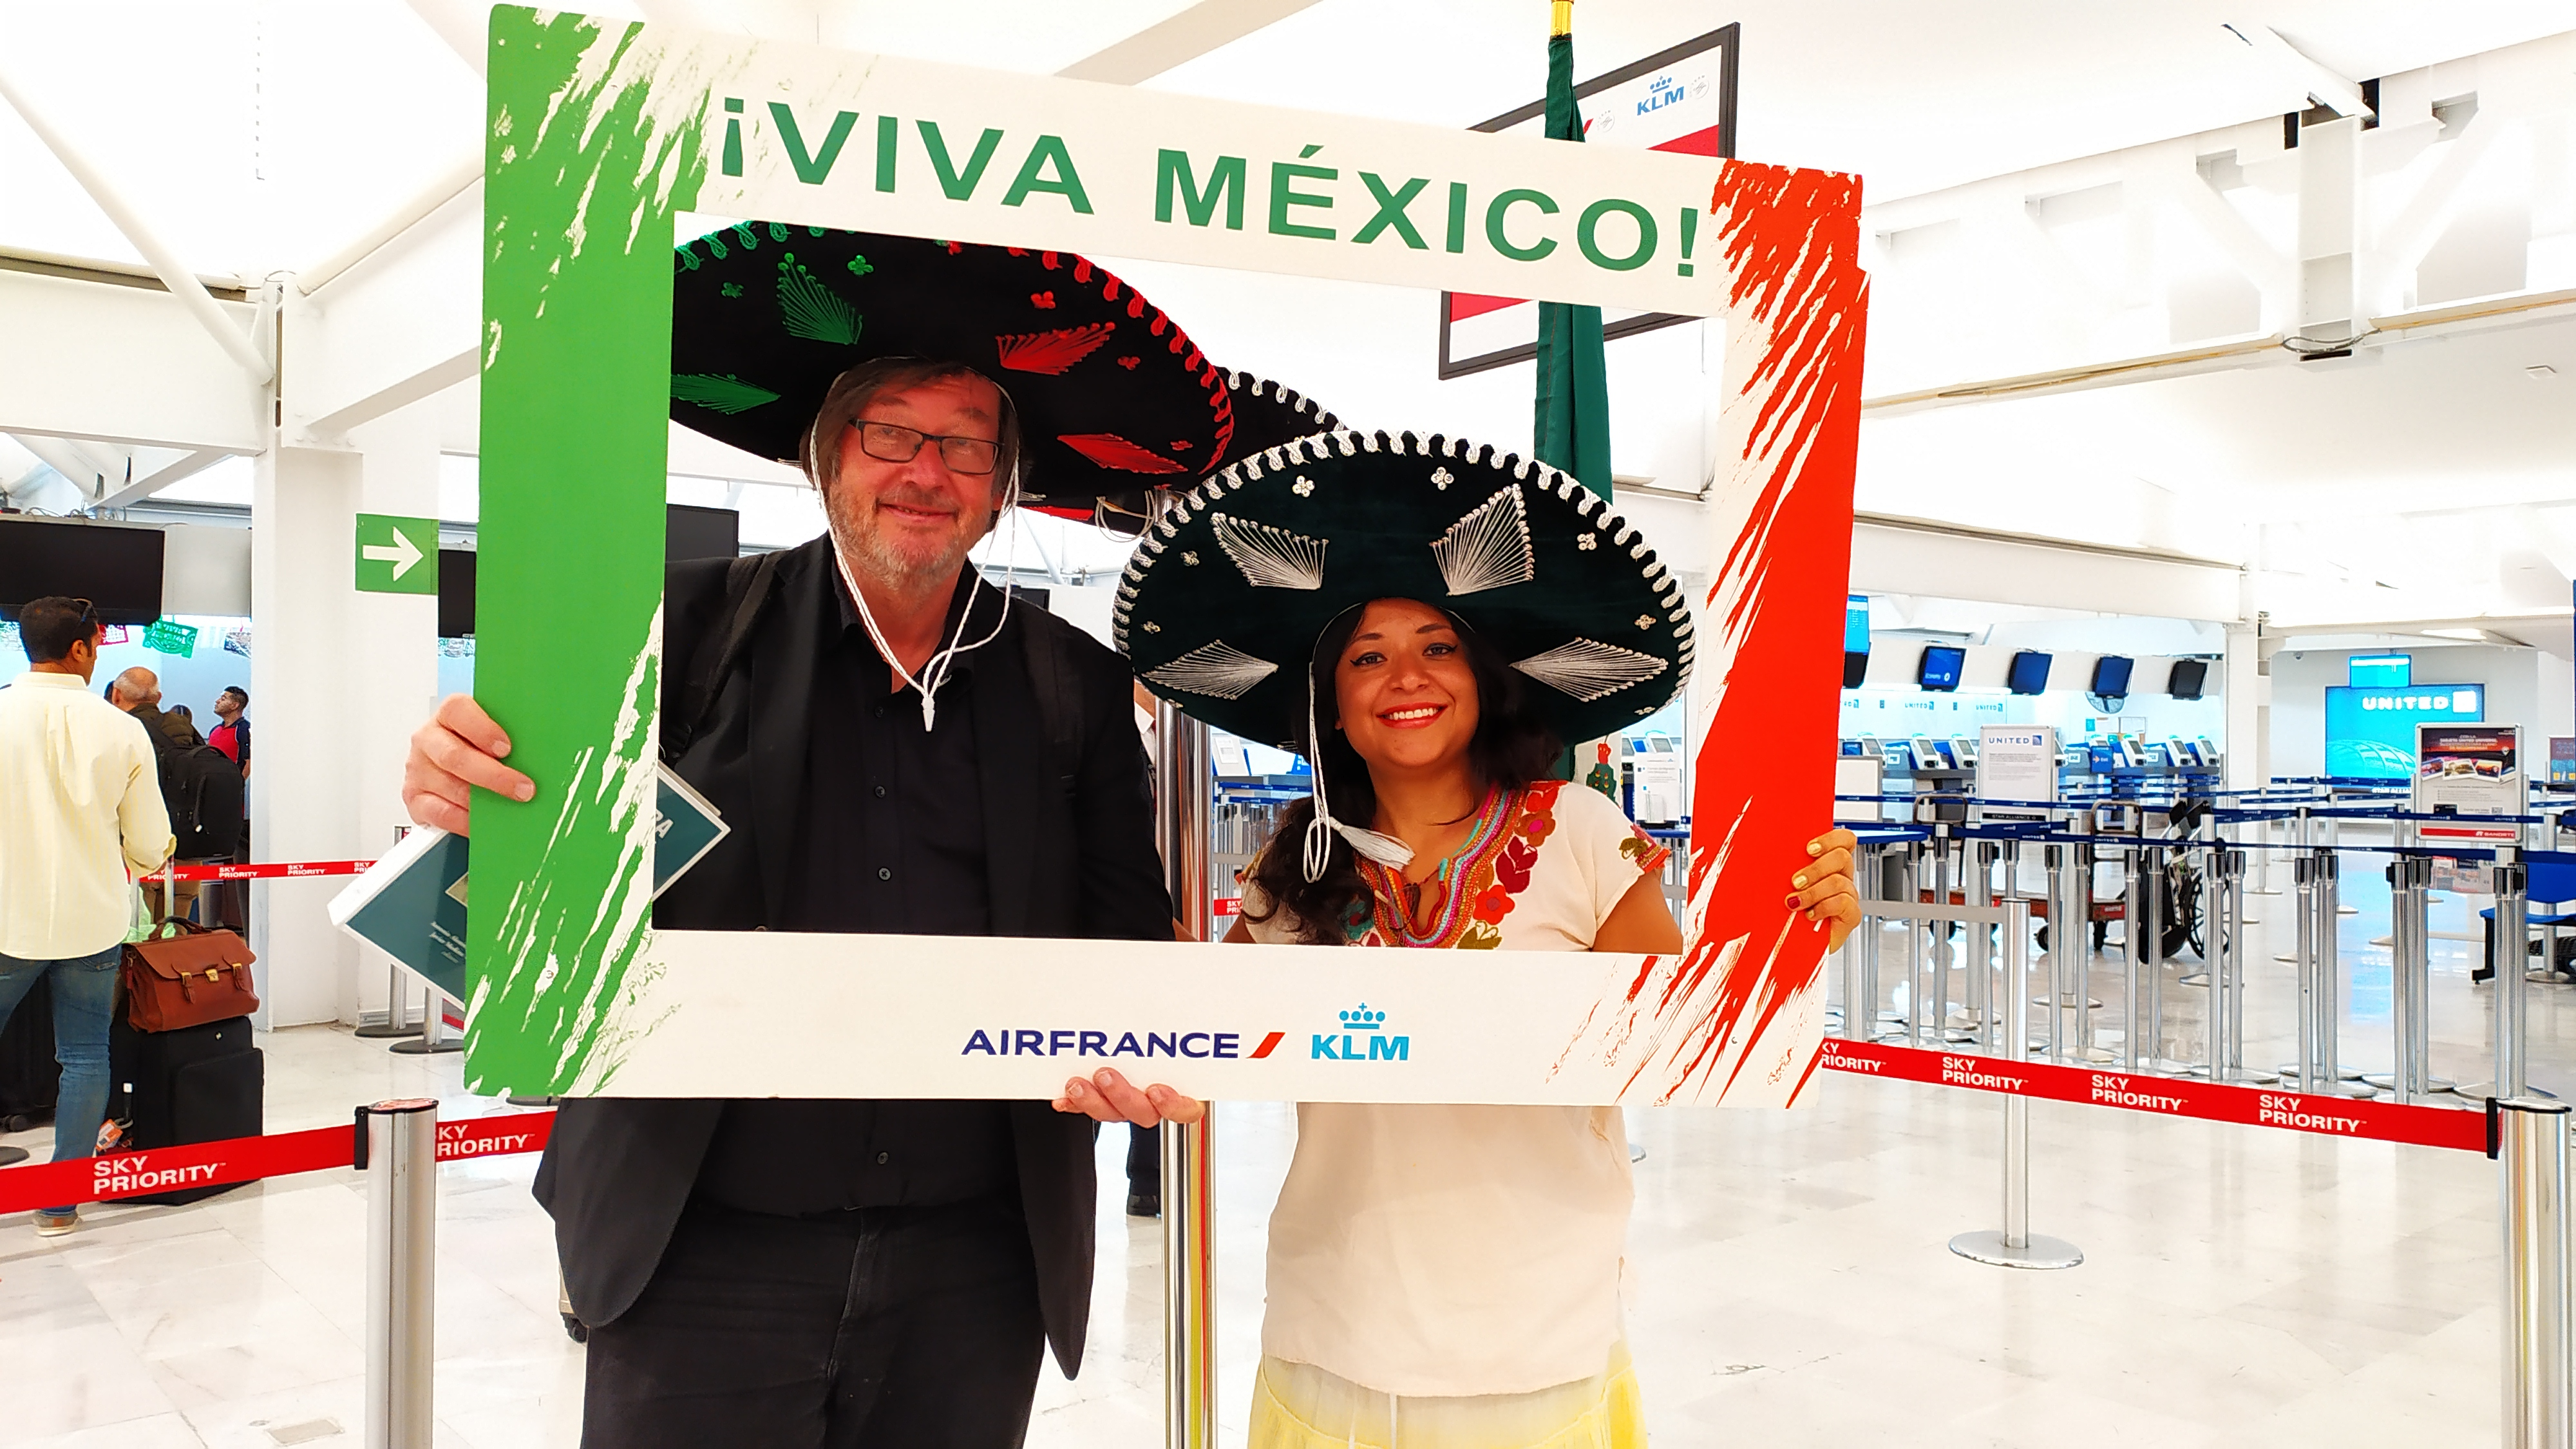 Hasta pronto México